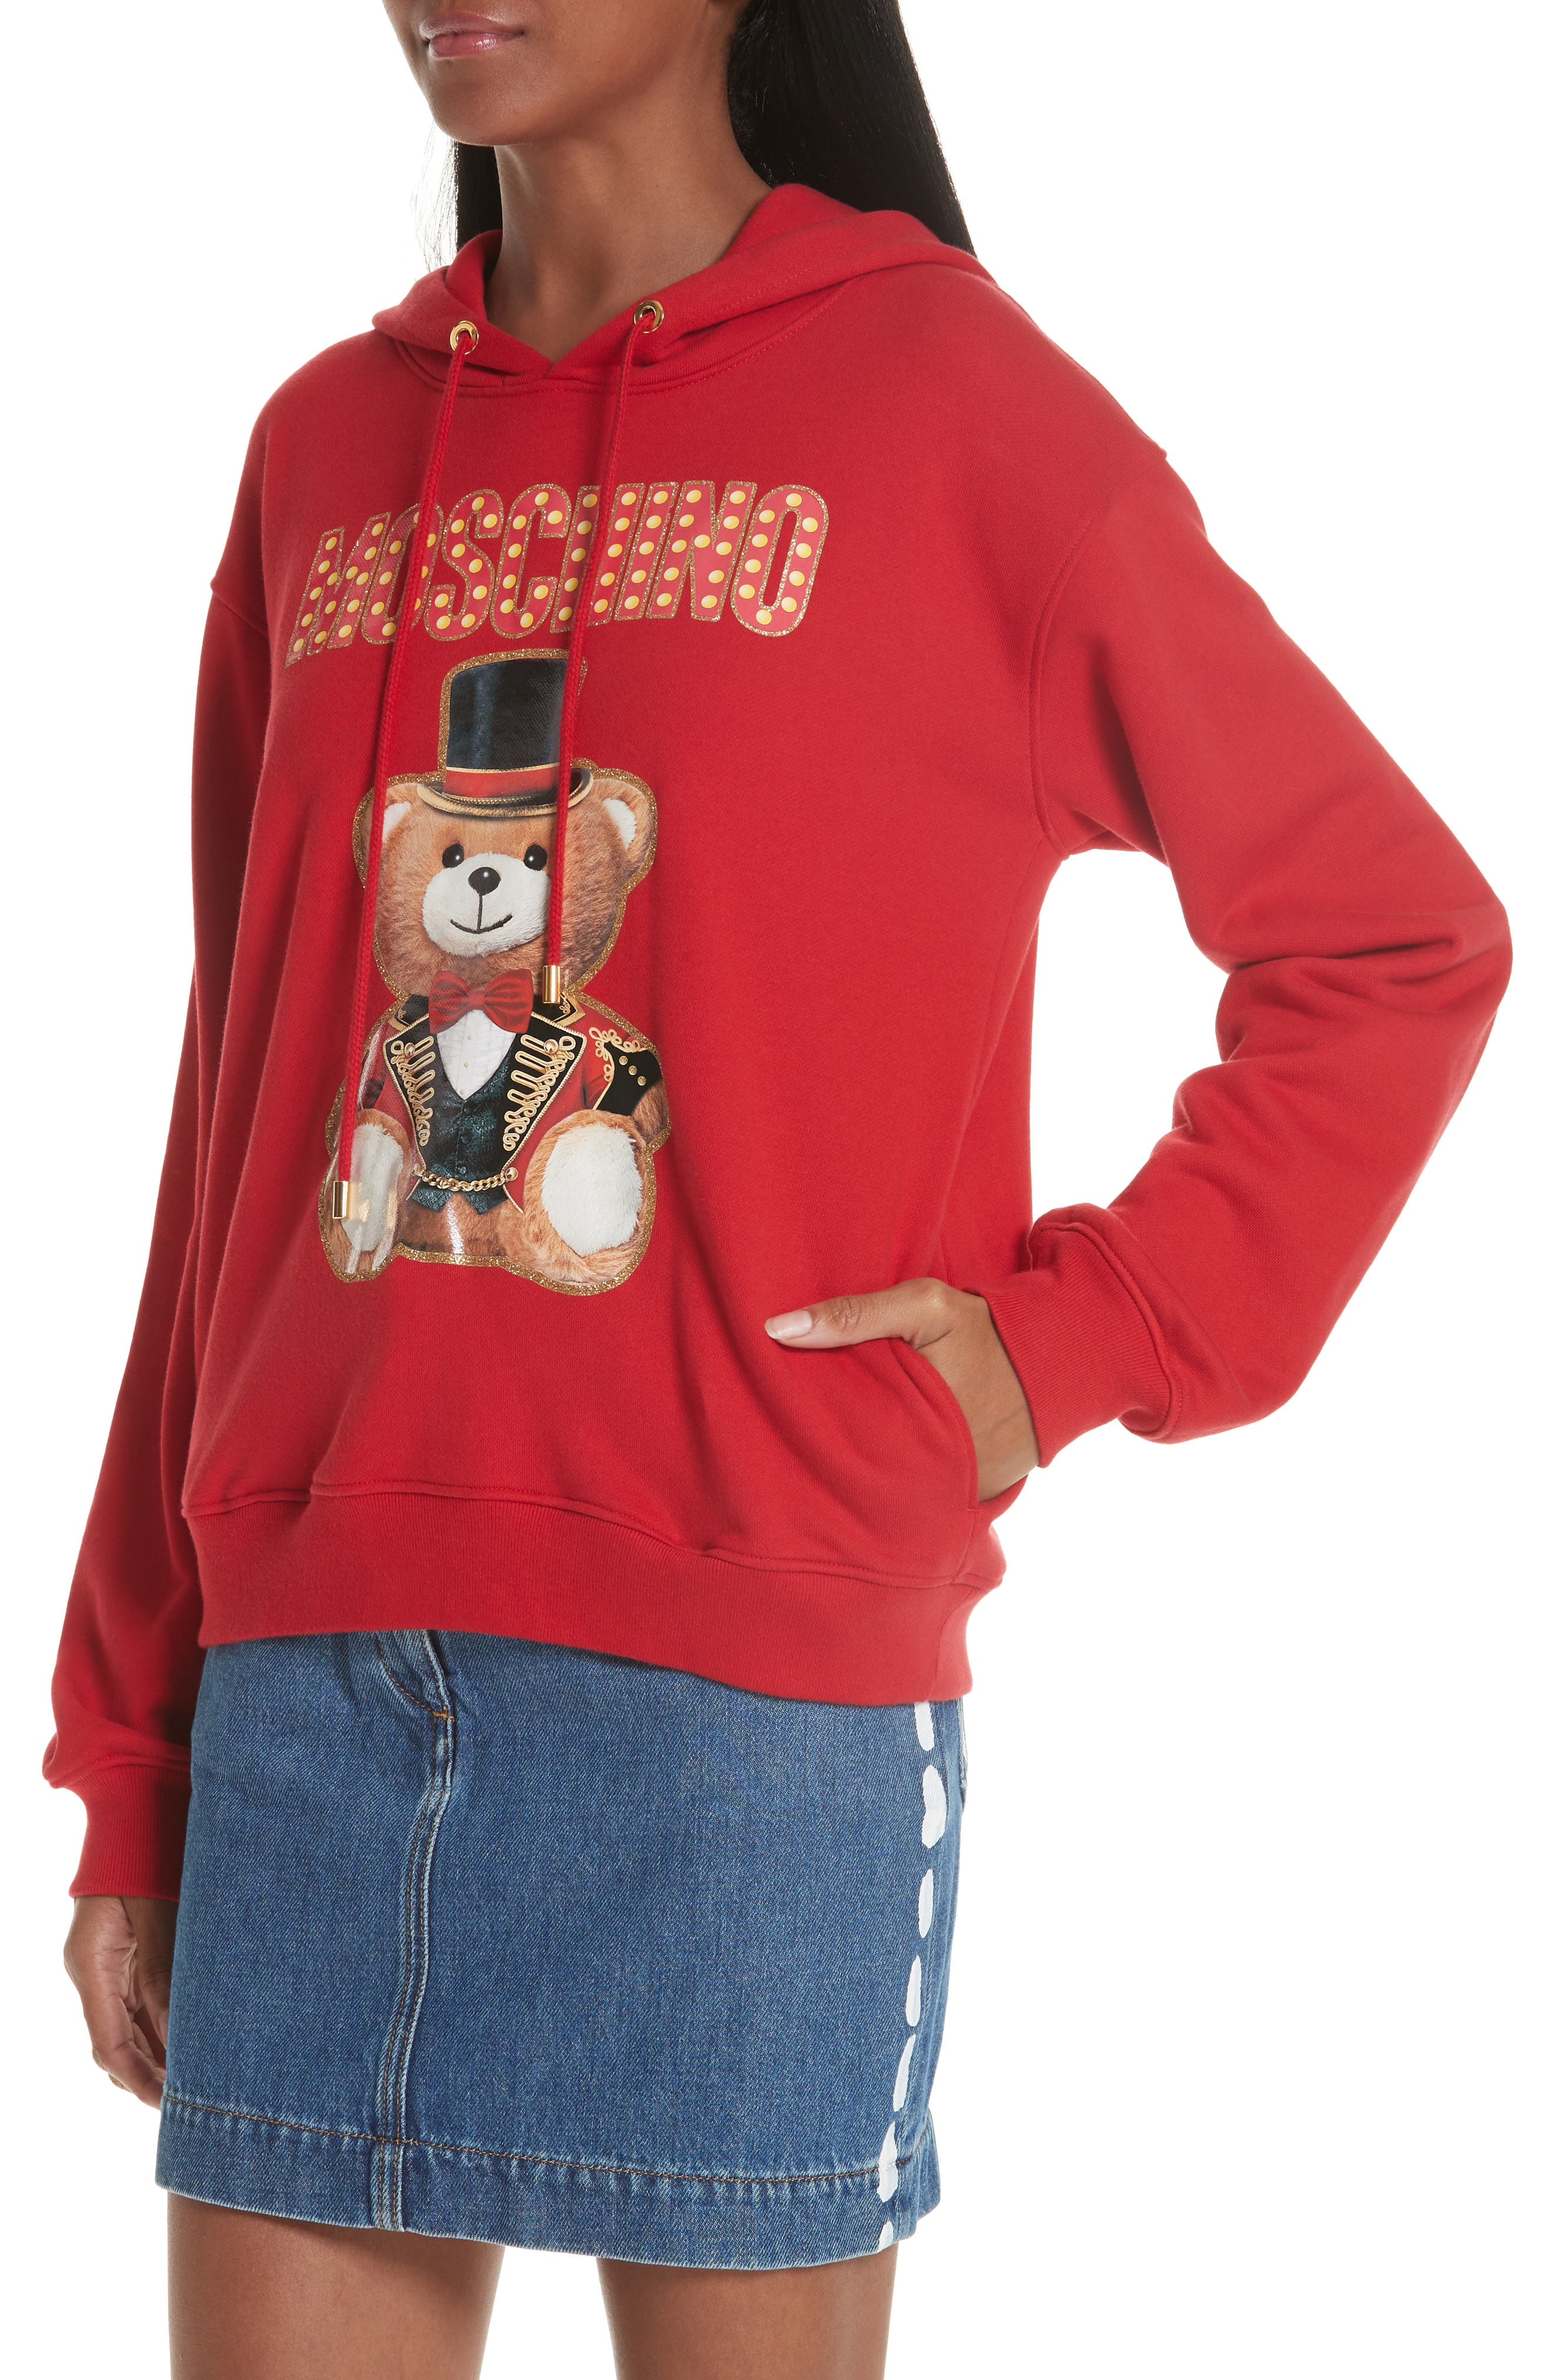 MOSCHINO, Circus Teddy Sweatshirt, Alternate thumbnail 5, color, RED